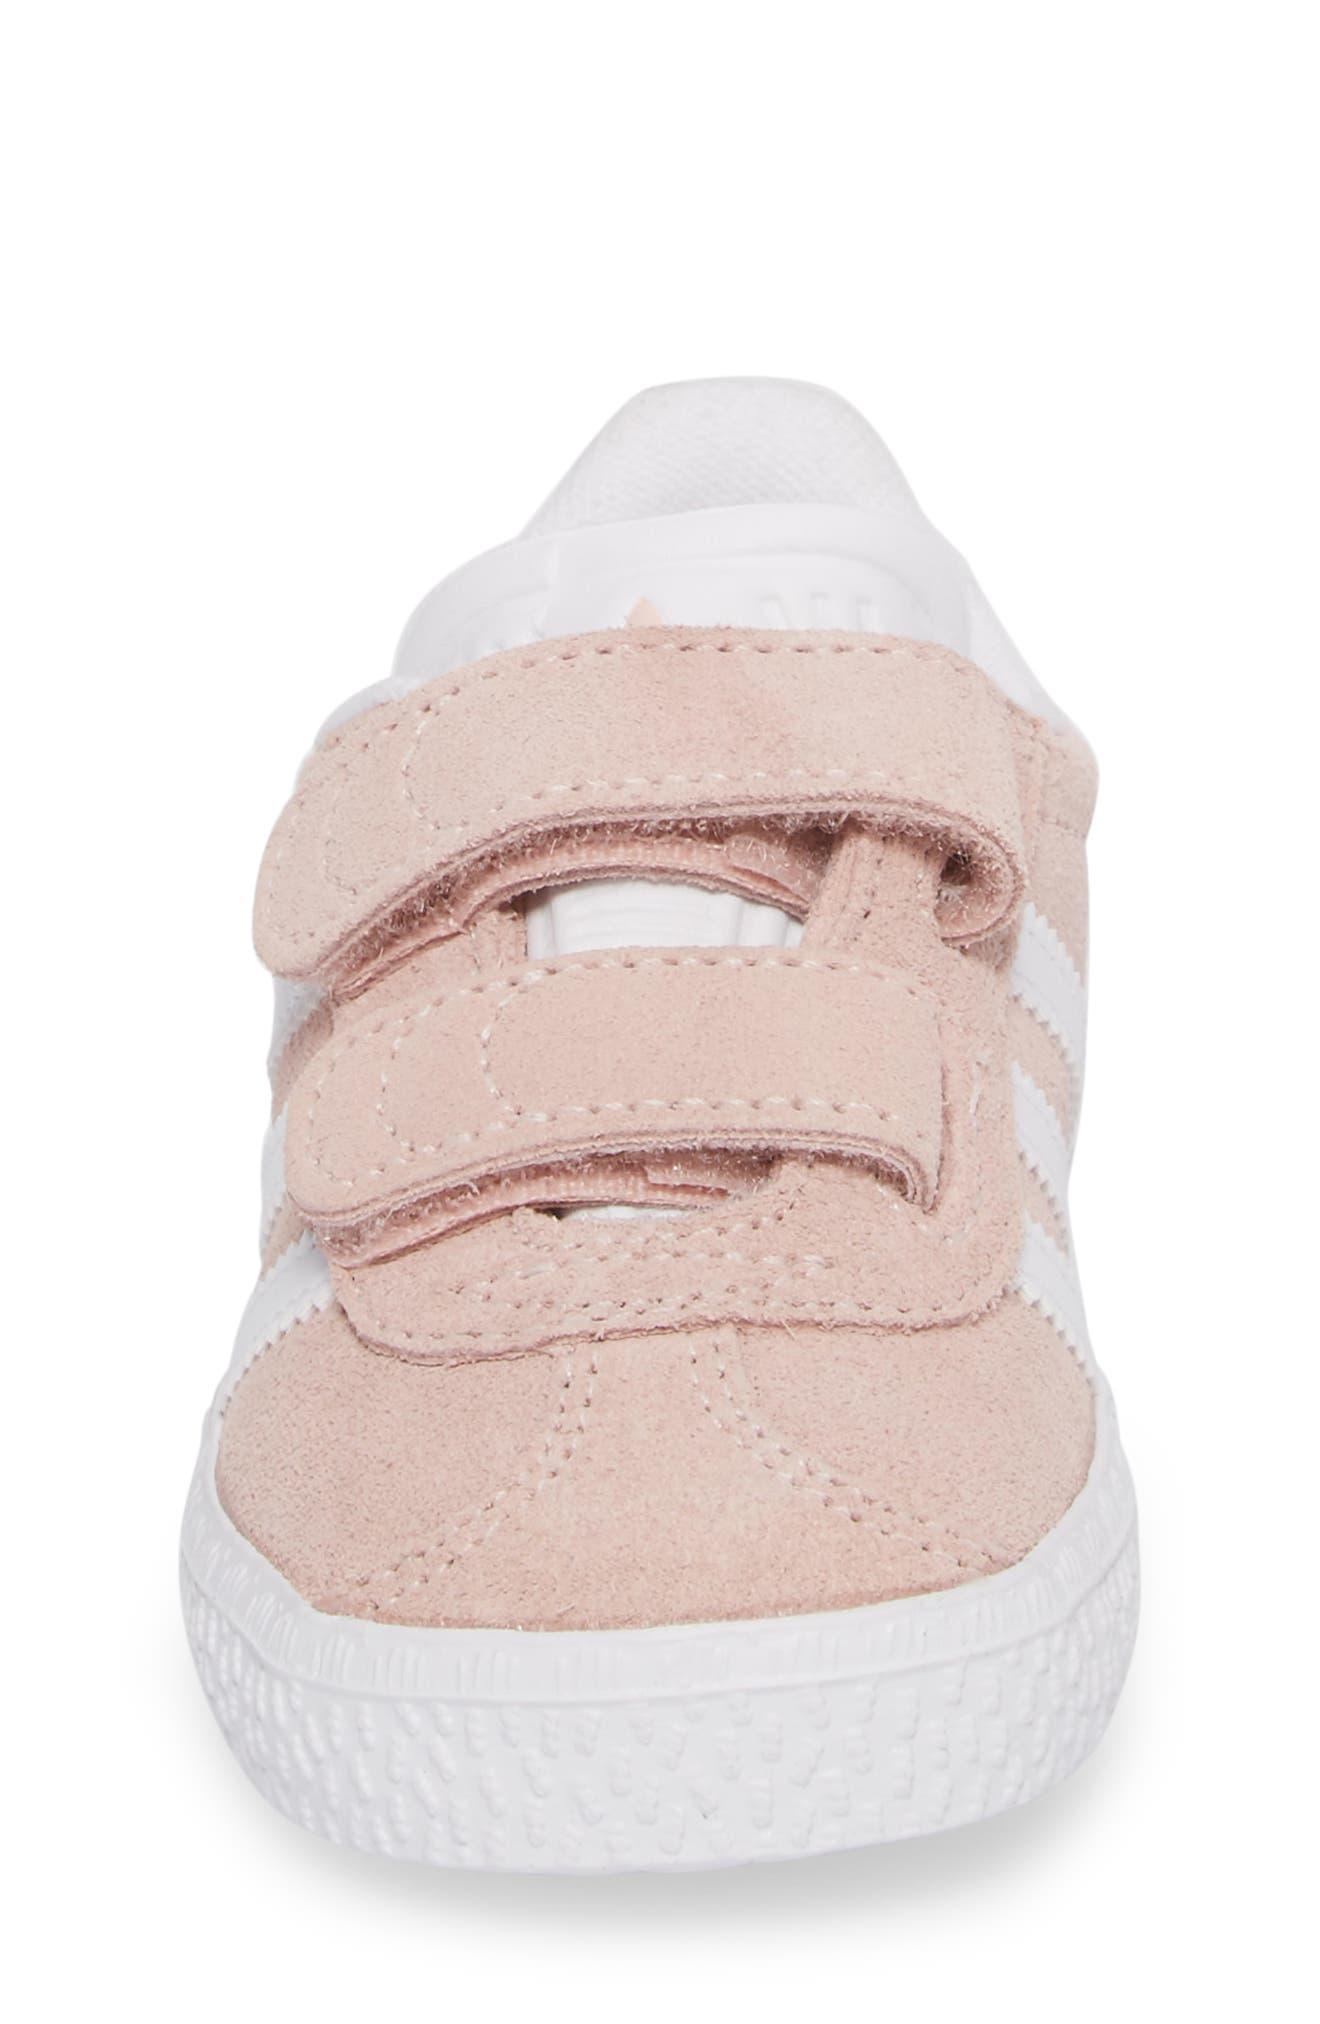 Gazelle Sneaker,                             Alternate thumbnail 4, color,                             Icey Pink / White / White